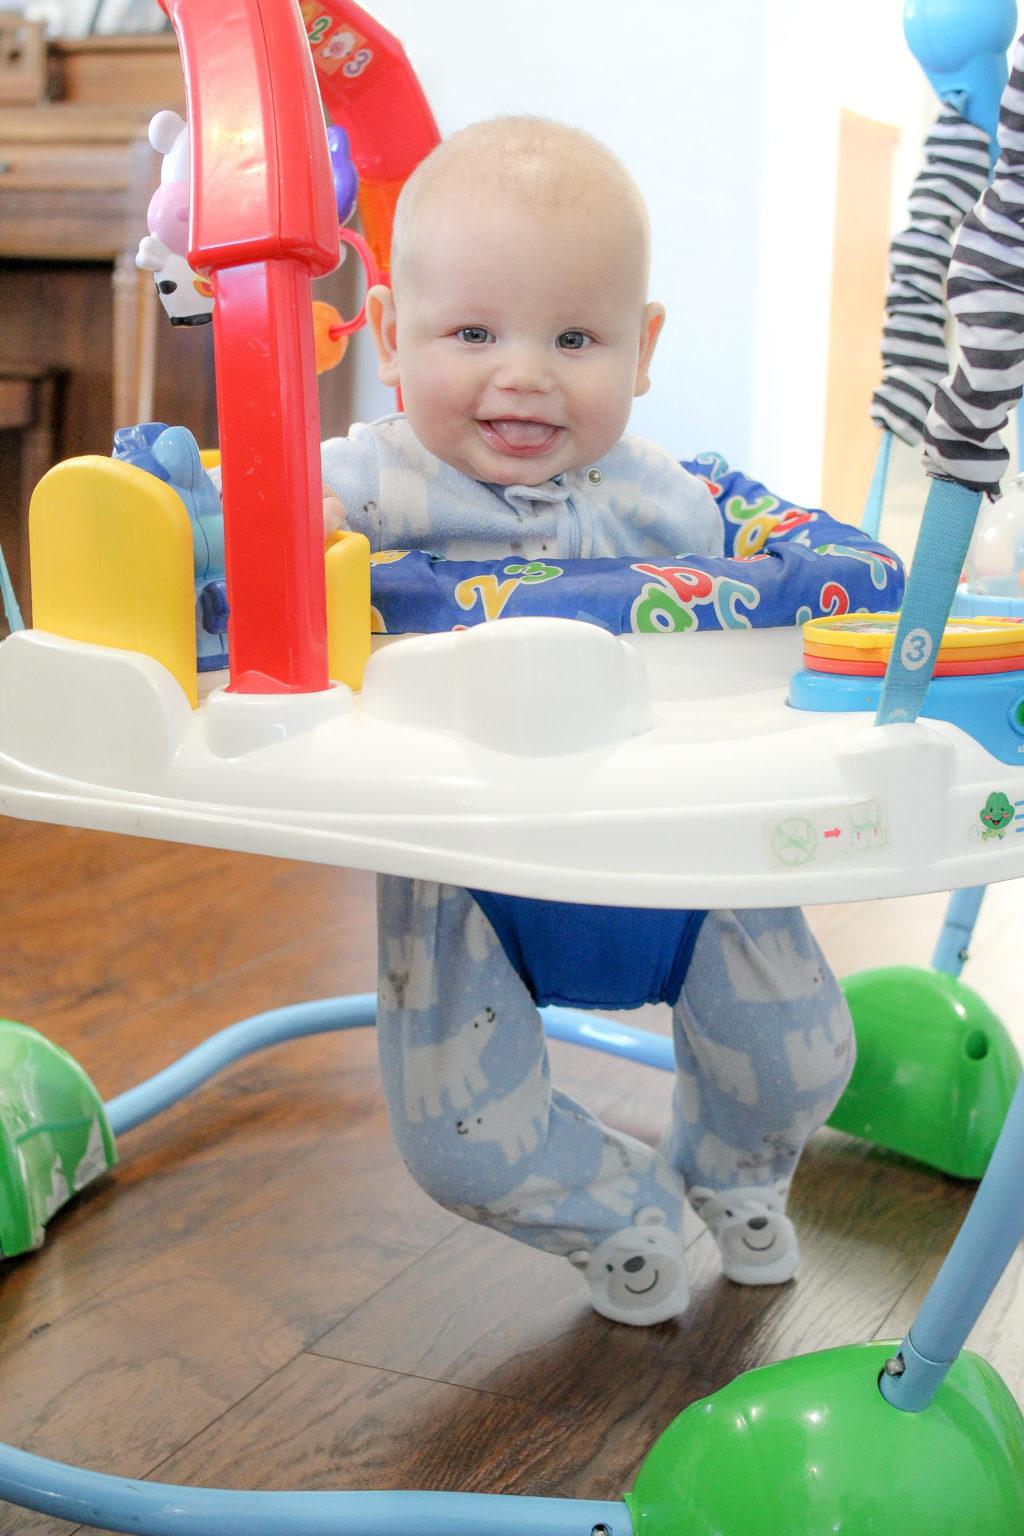 Baby probiotics. Baby probiotic powder. b infantis Baby Probiotic